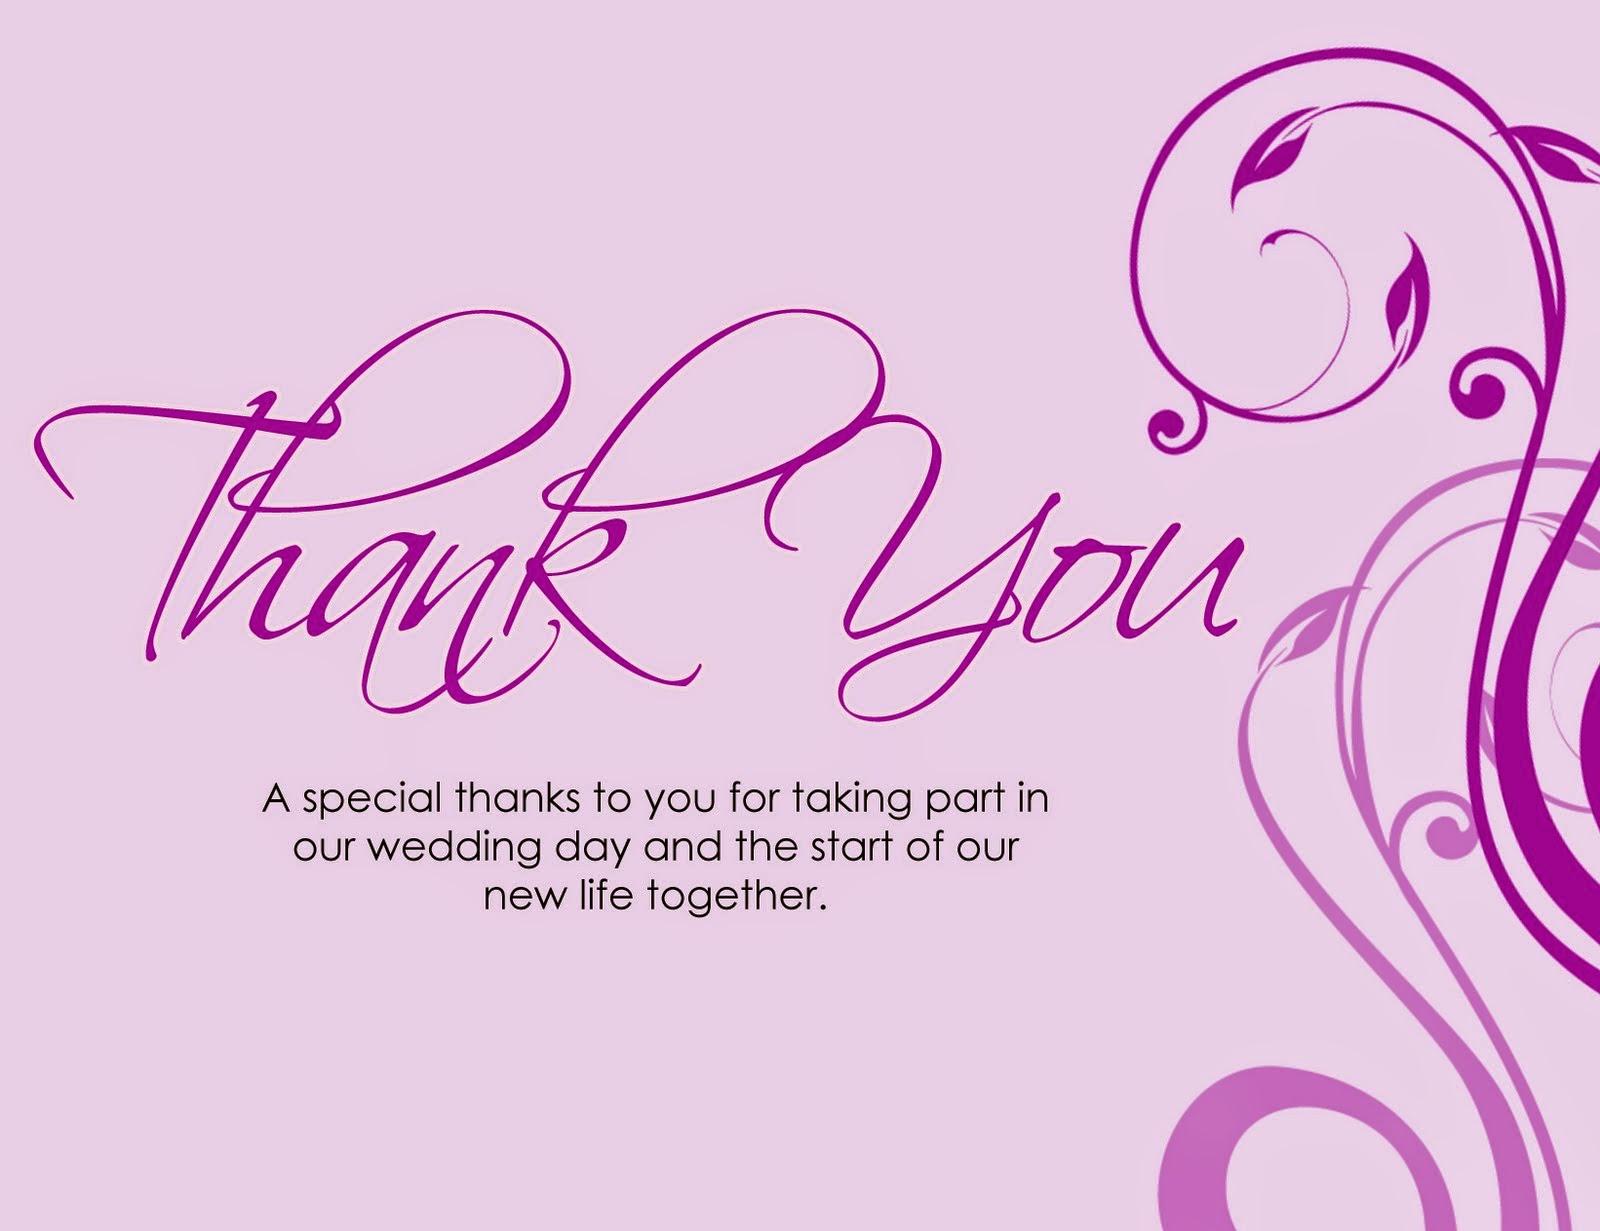 Wedding Gift Thank You Card Template: Printable Birthday Cards: Printable Thank You Cards